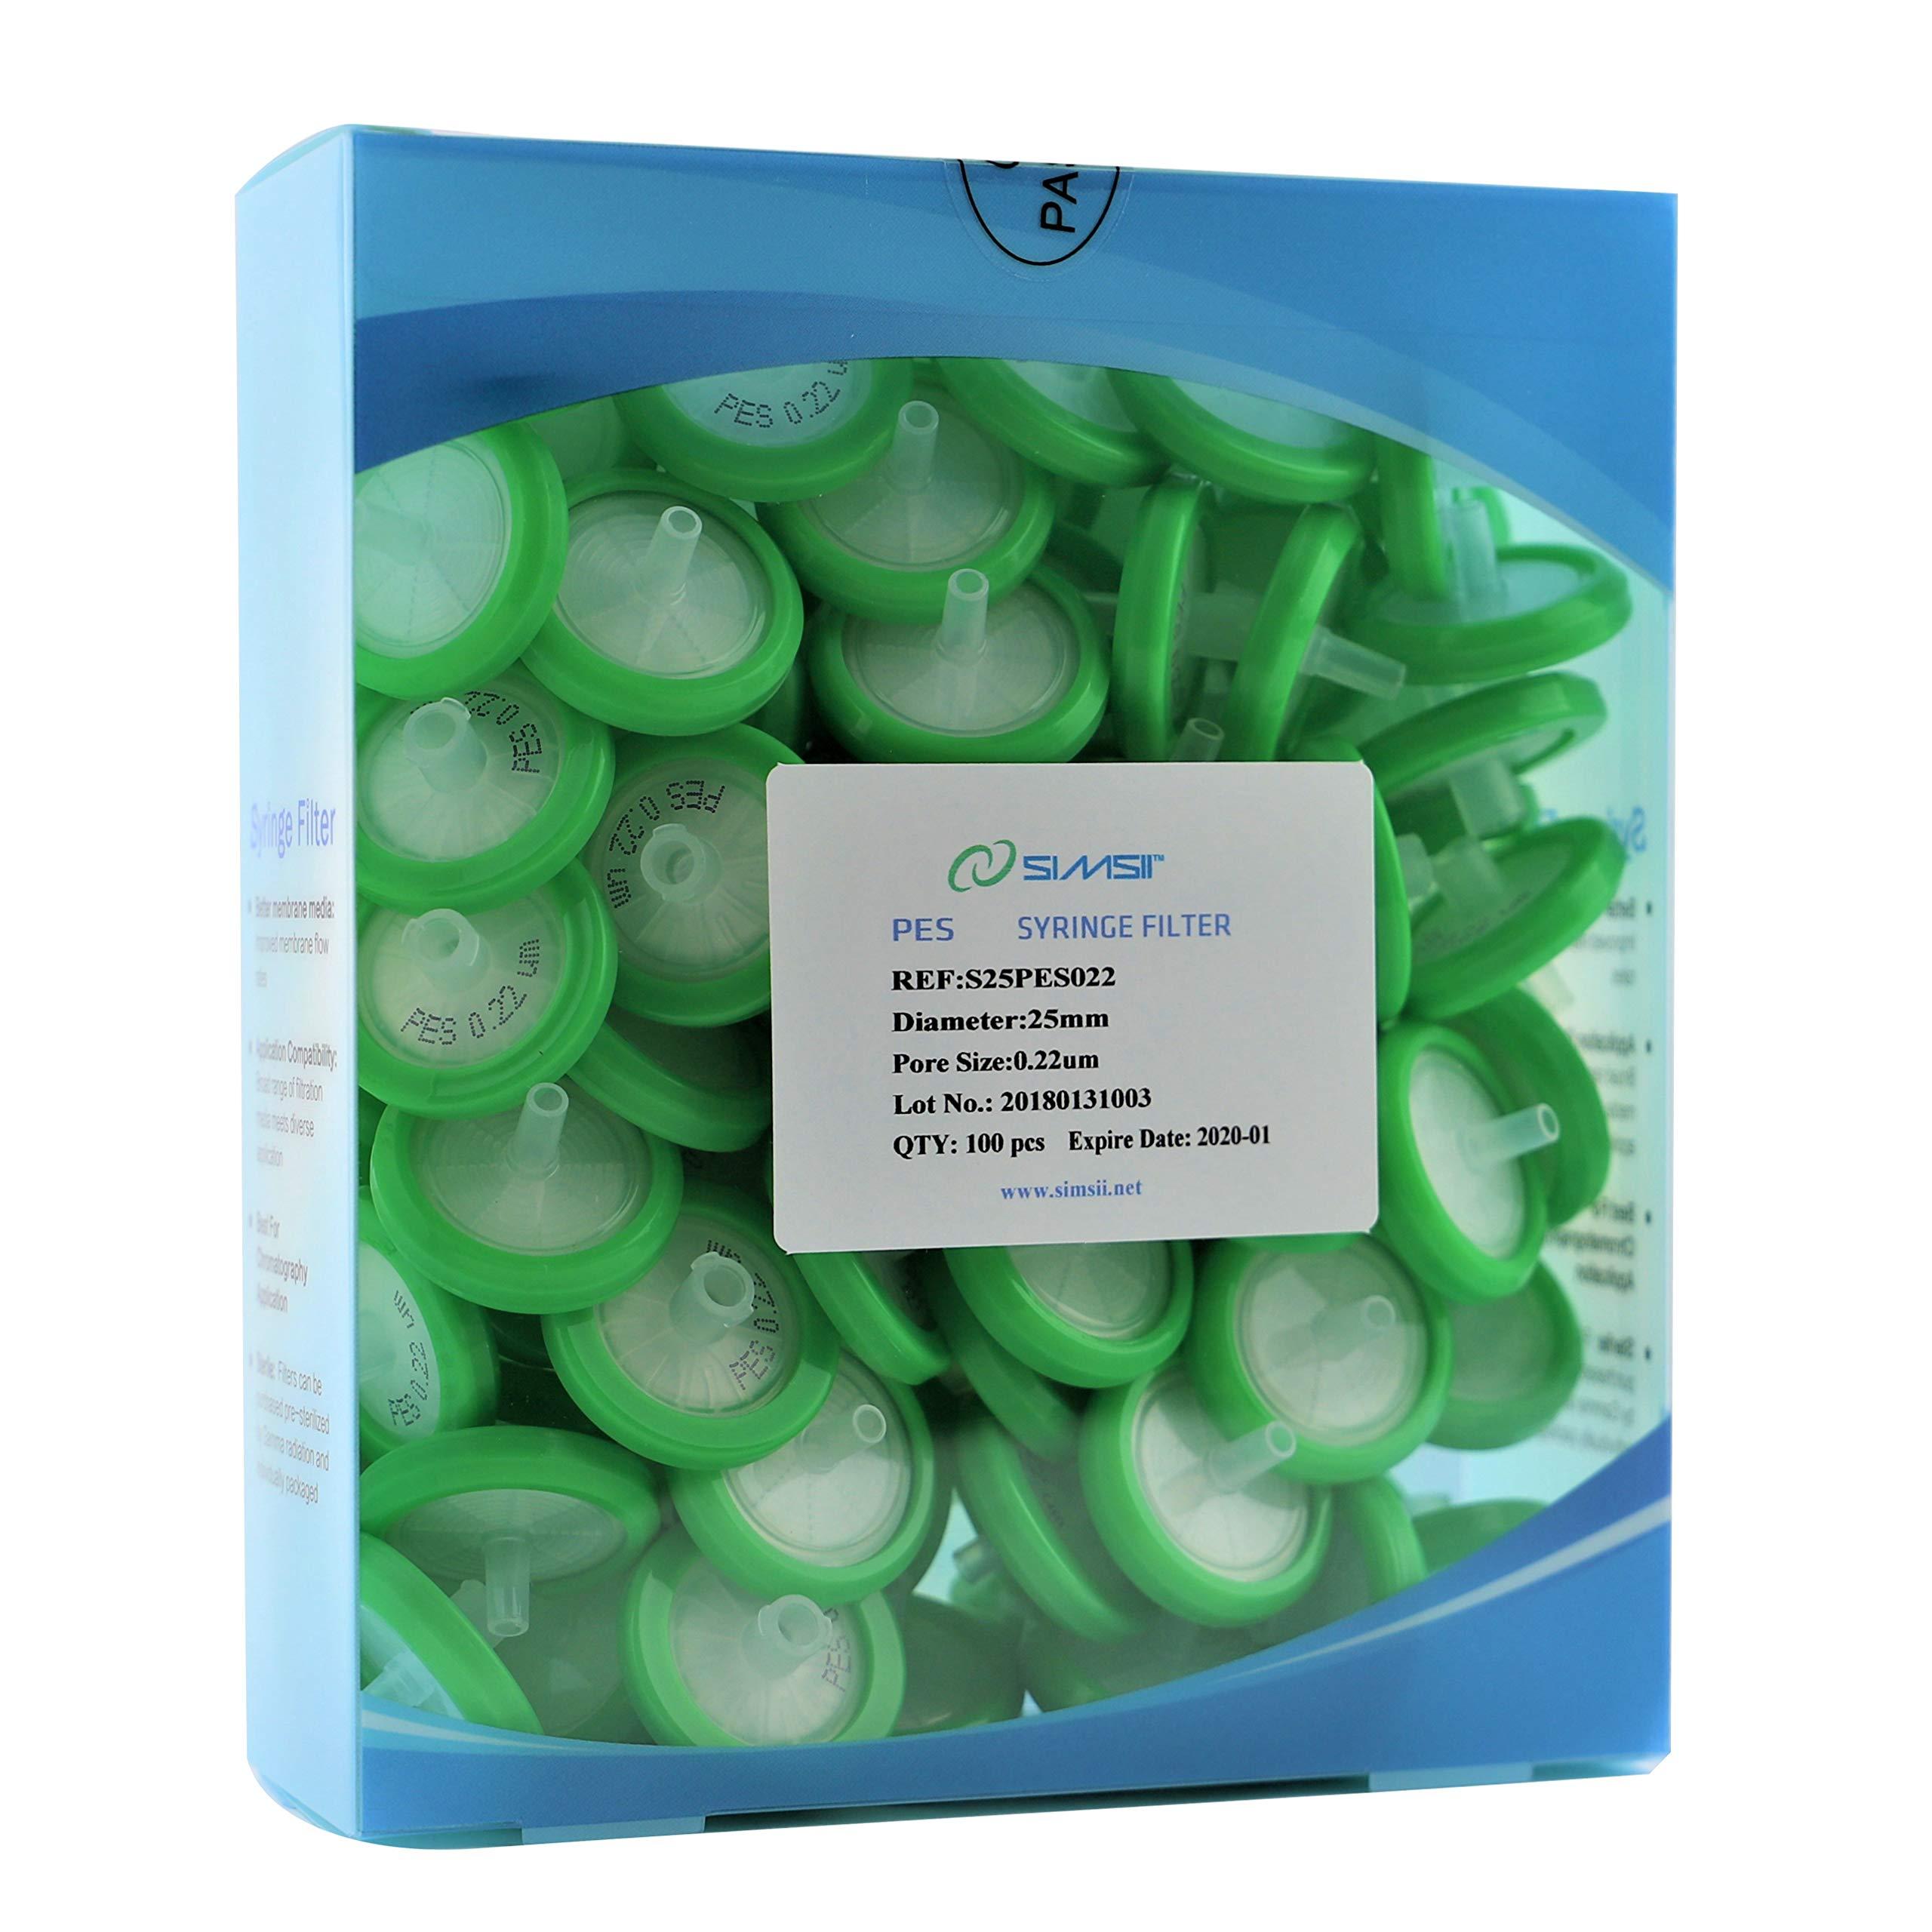 Simsii Syringe Filter, PES, Non-Sterile, Diameter 13 mm, Pore Size 0.22 um, Pack of 100 by Simsii